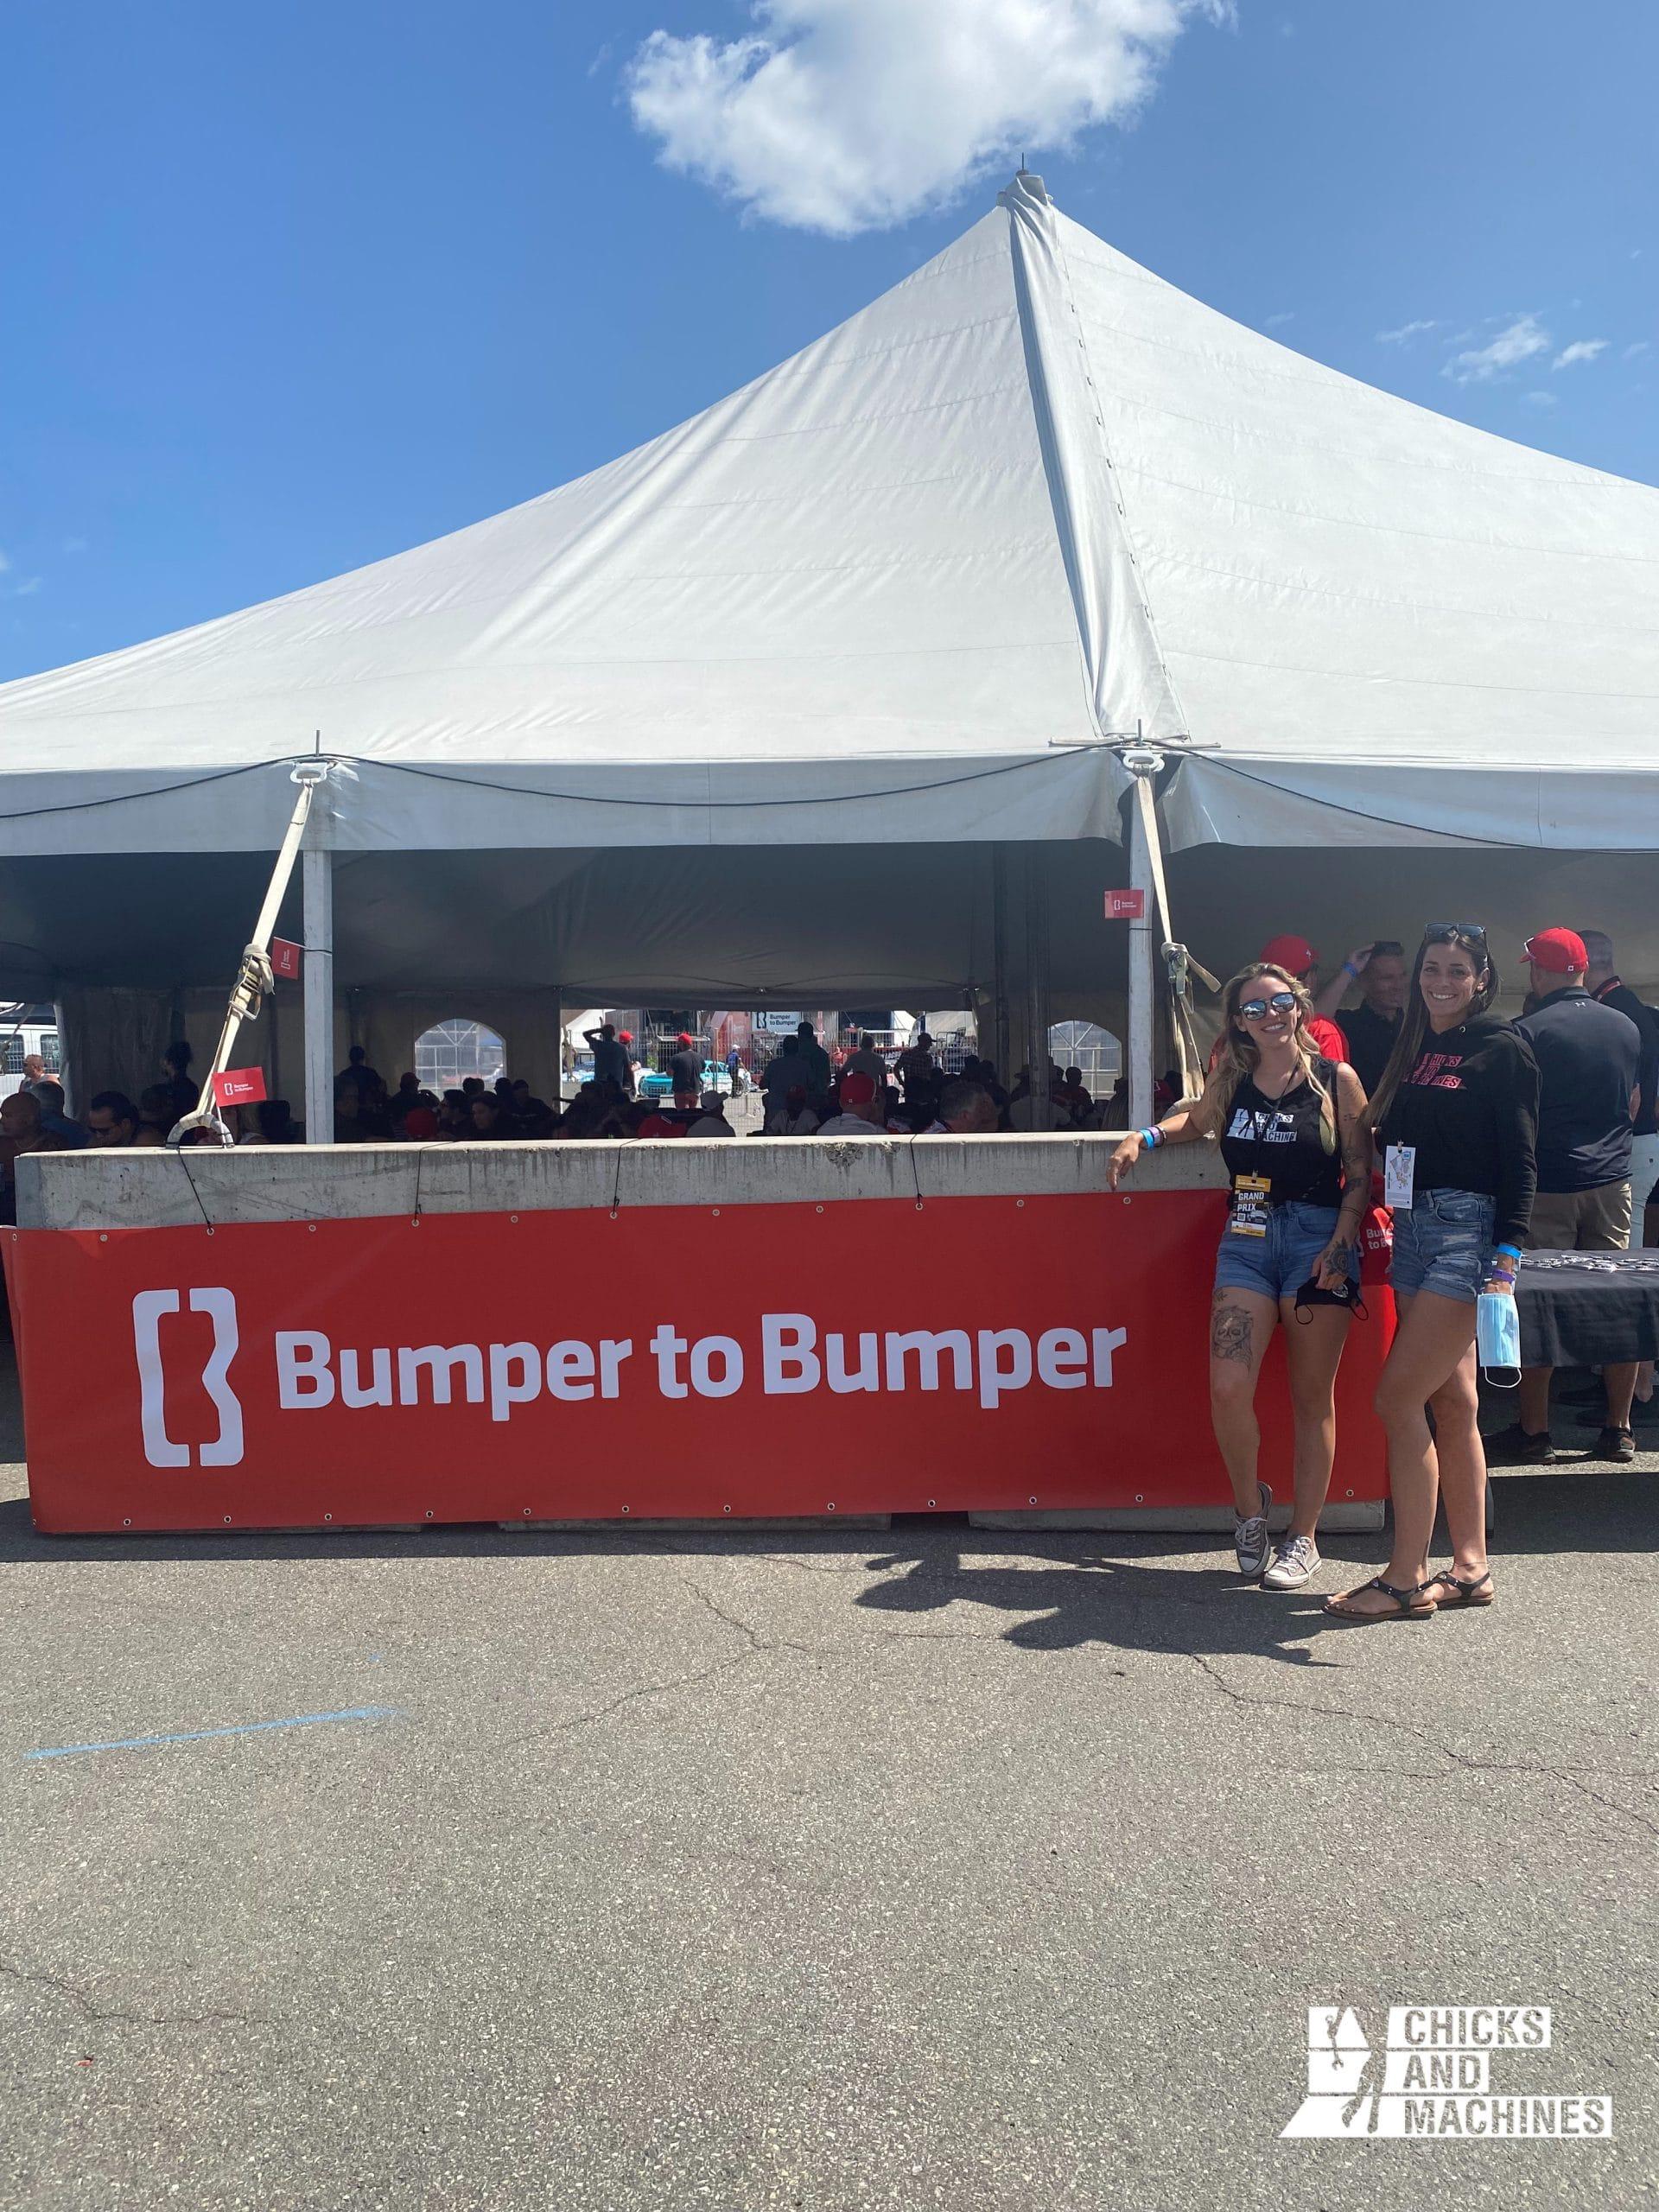 Merci à Bumper to Bumper pour cette belle invitation !